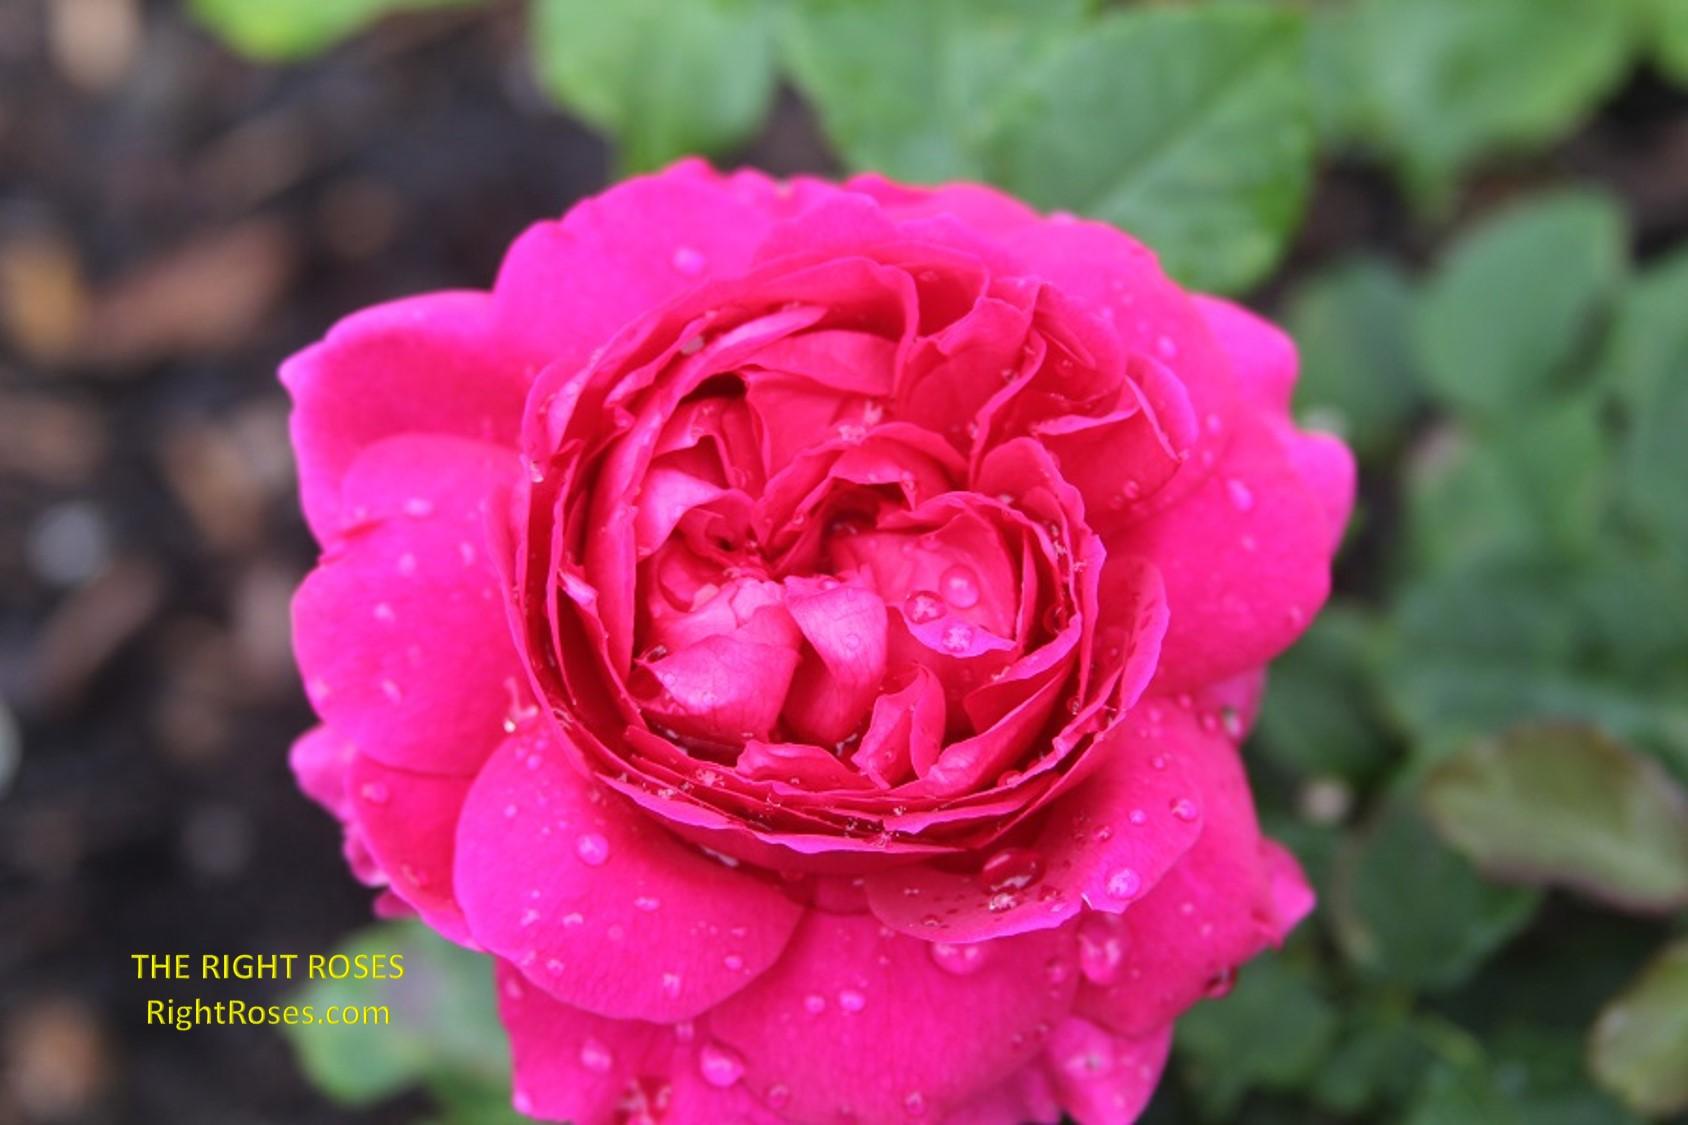 Gabriel Oak rose review the right roses score david austin top best garden store english roses rose products david austin